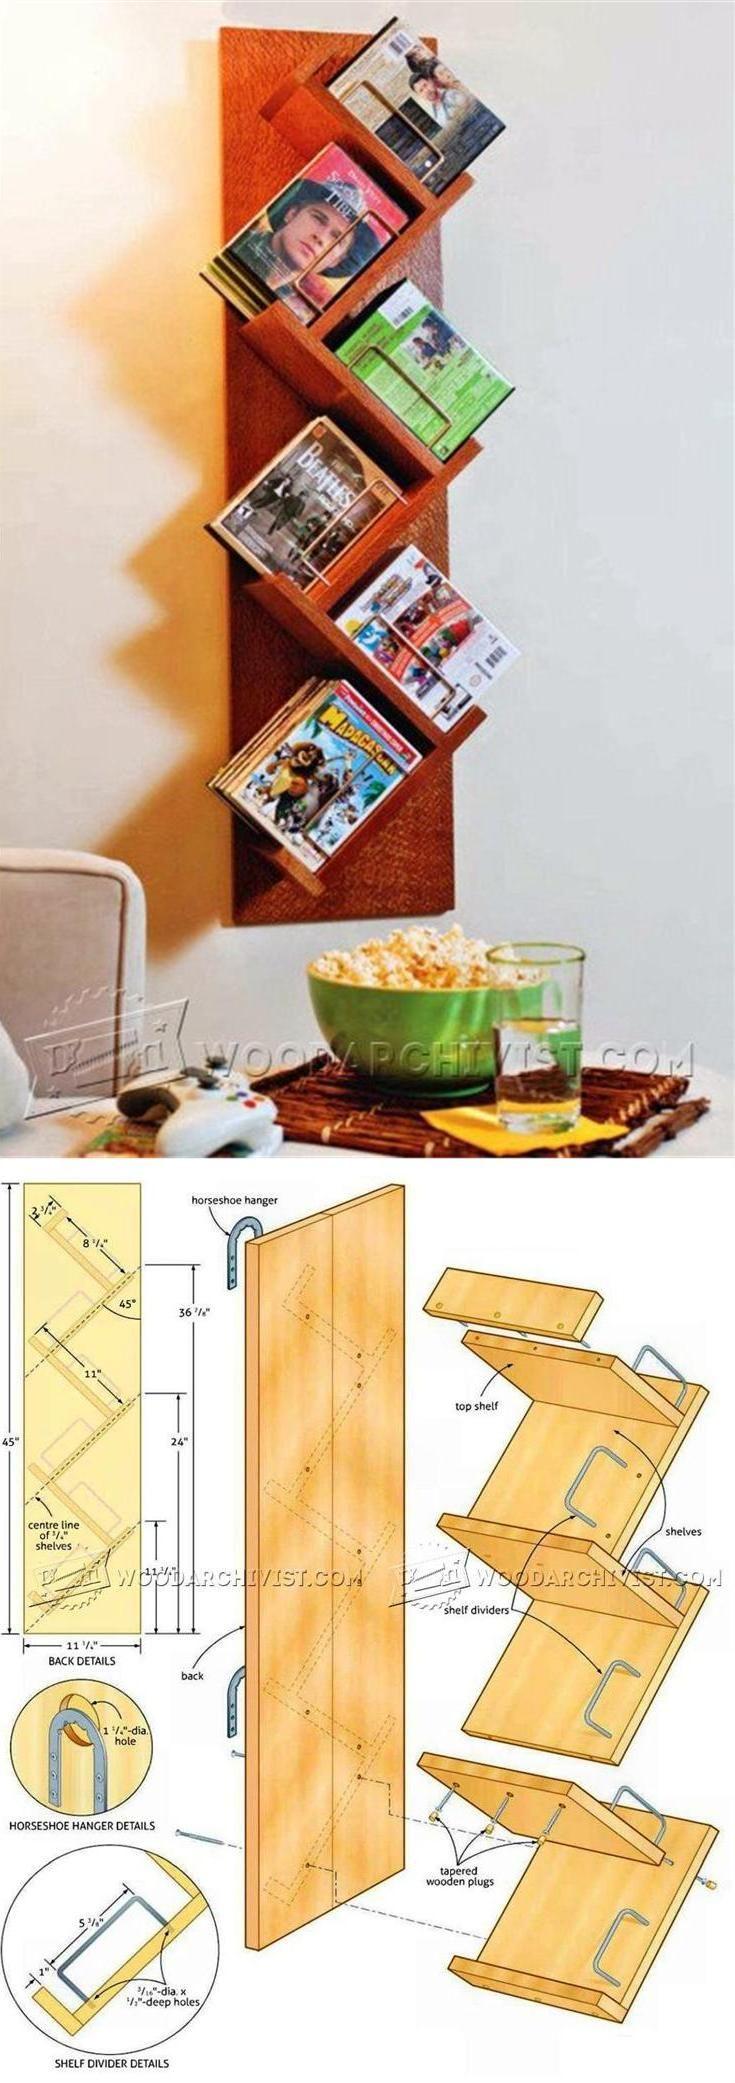 Media Storage Shelf Plans - Furniture Plans and Projects | WoodArchivist.com